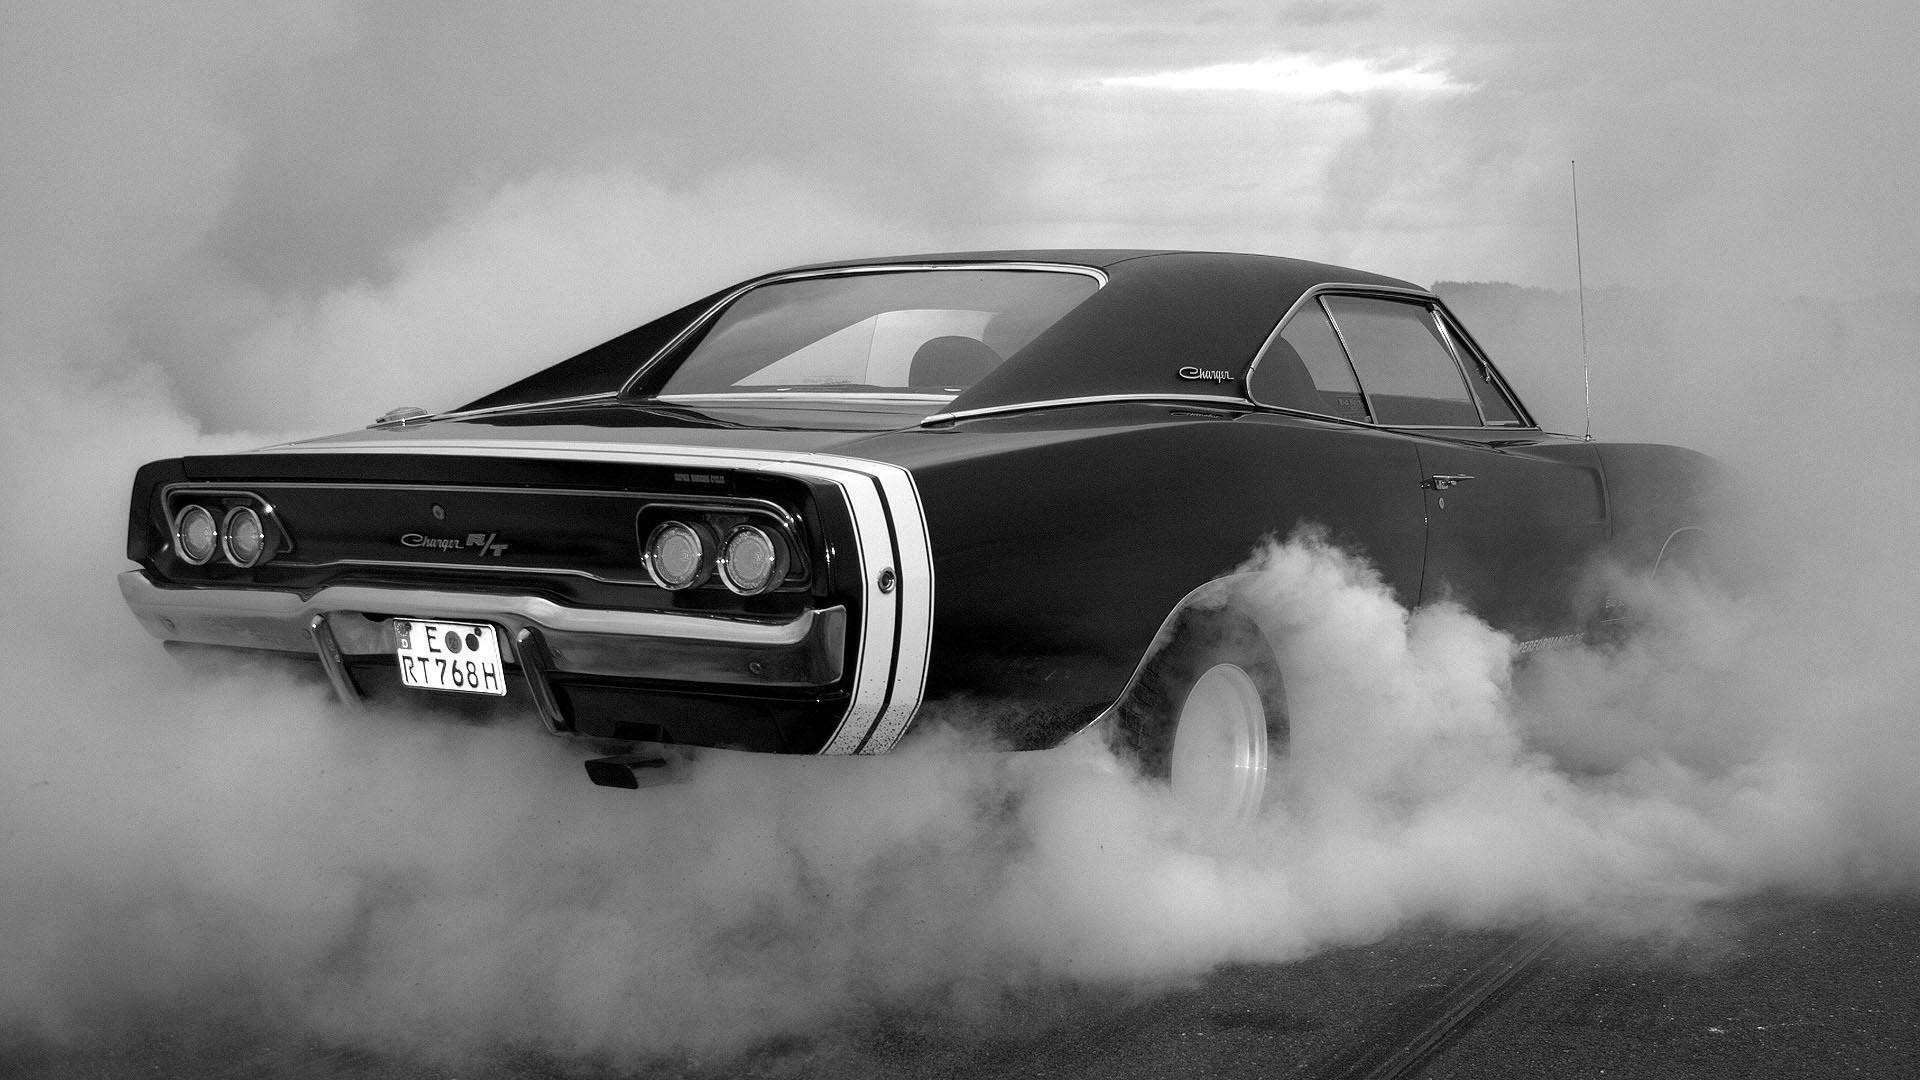 69 Dodge Charger Wallpaper 59 Images